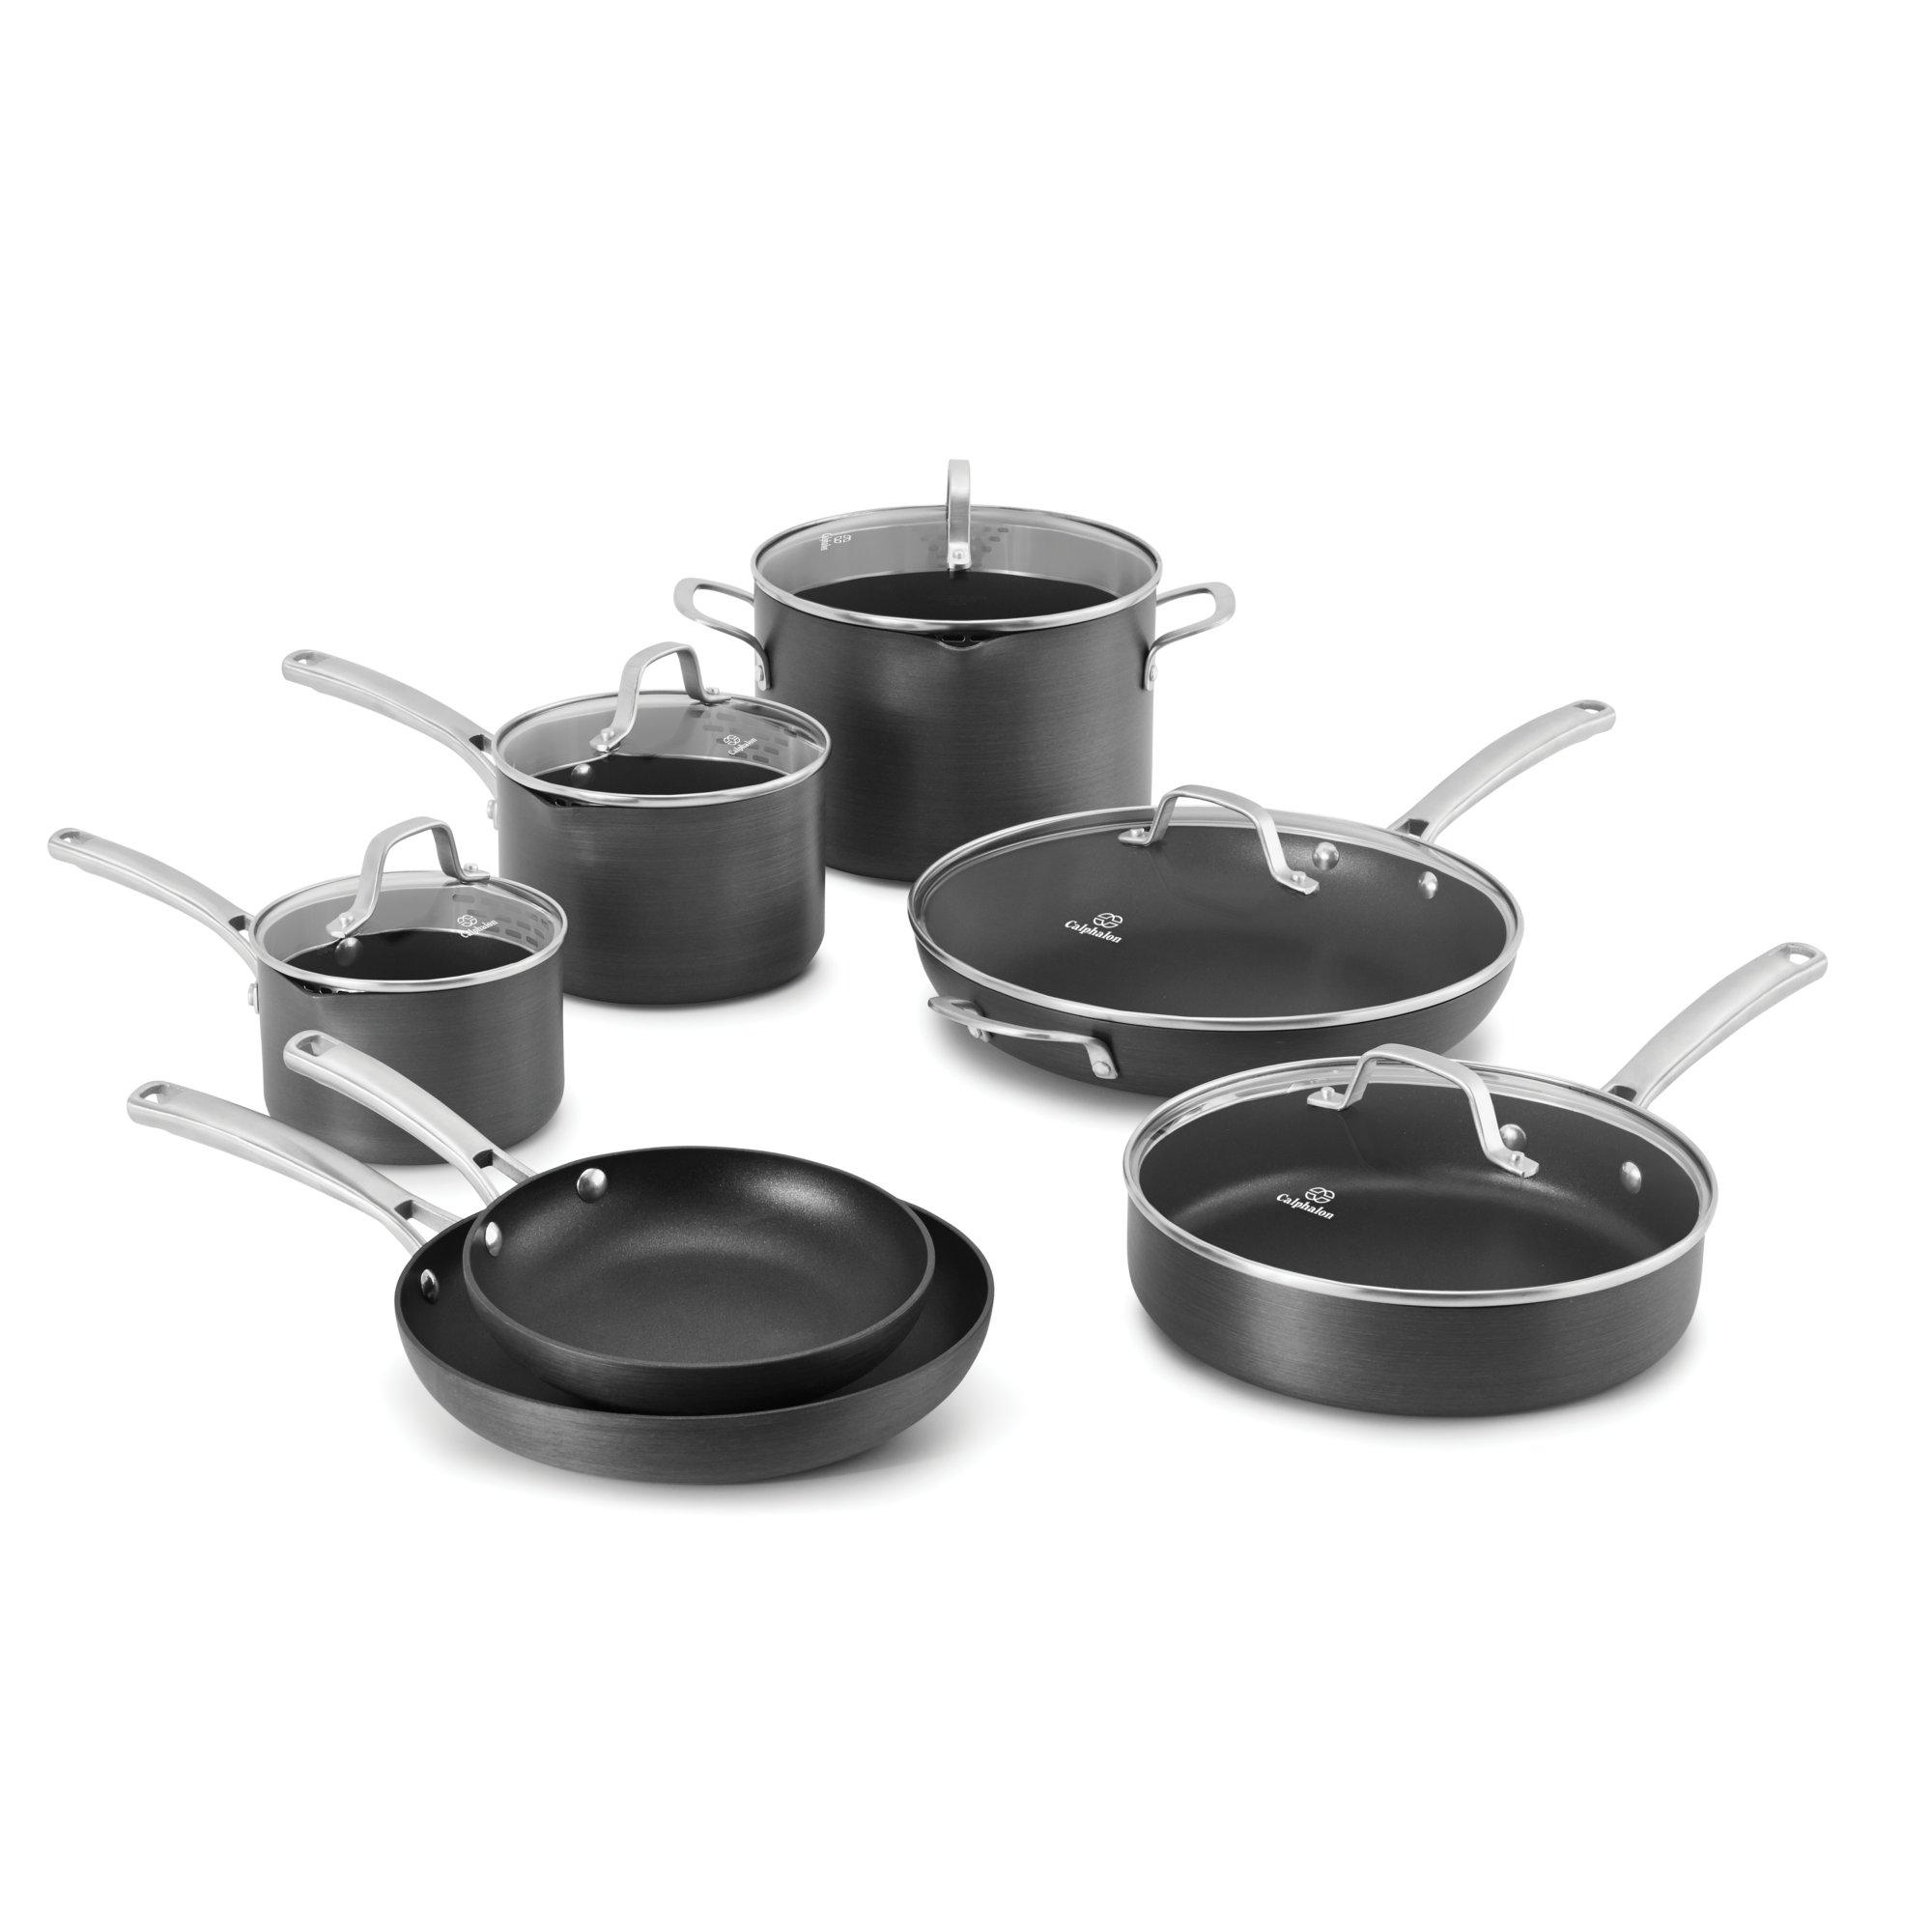 Calphalon Classic Nonstick 12 Pc Cookware Set